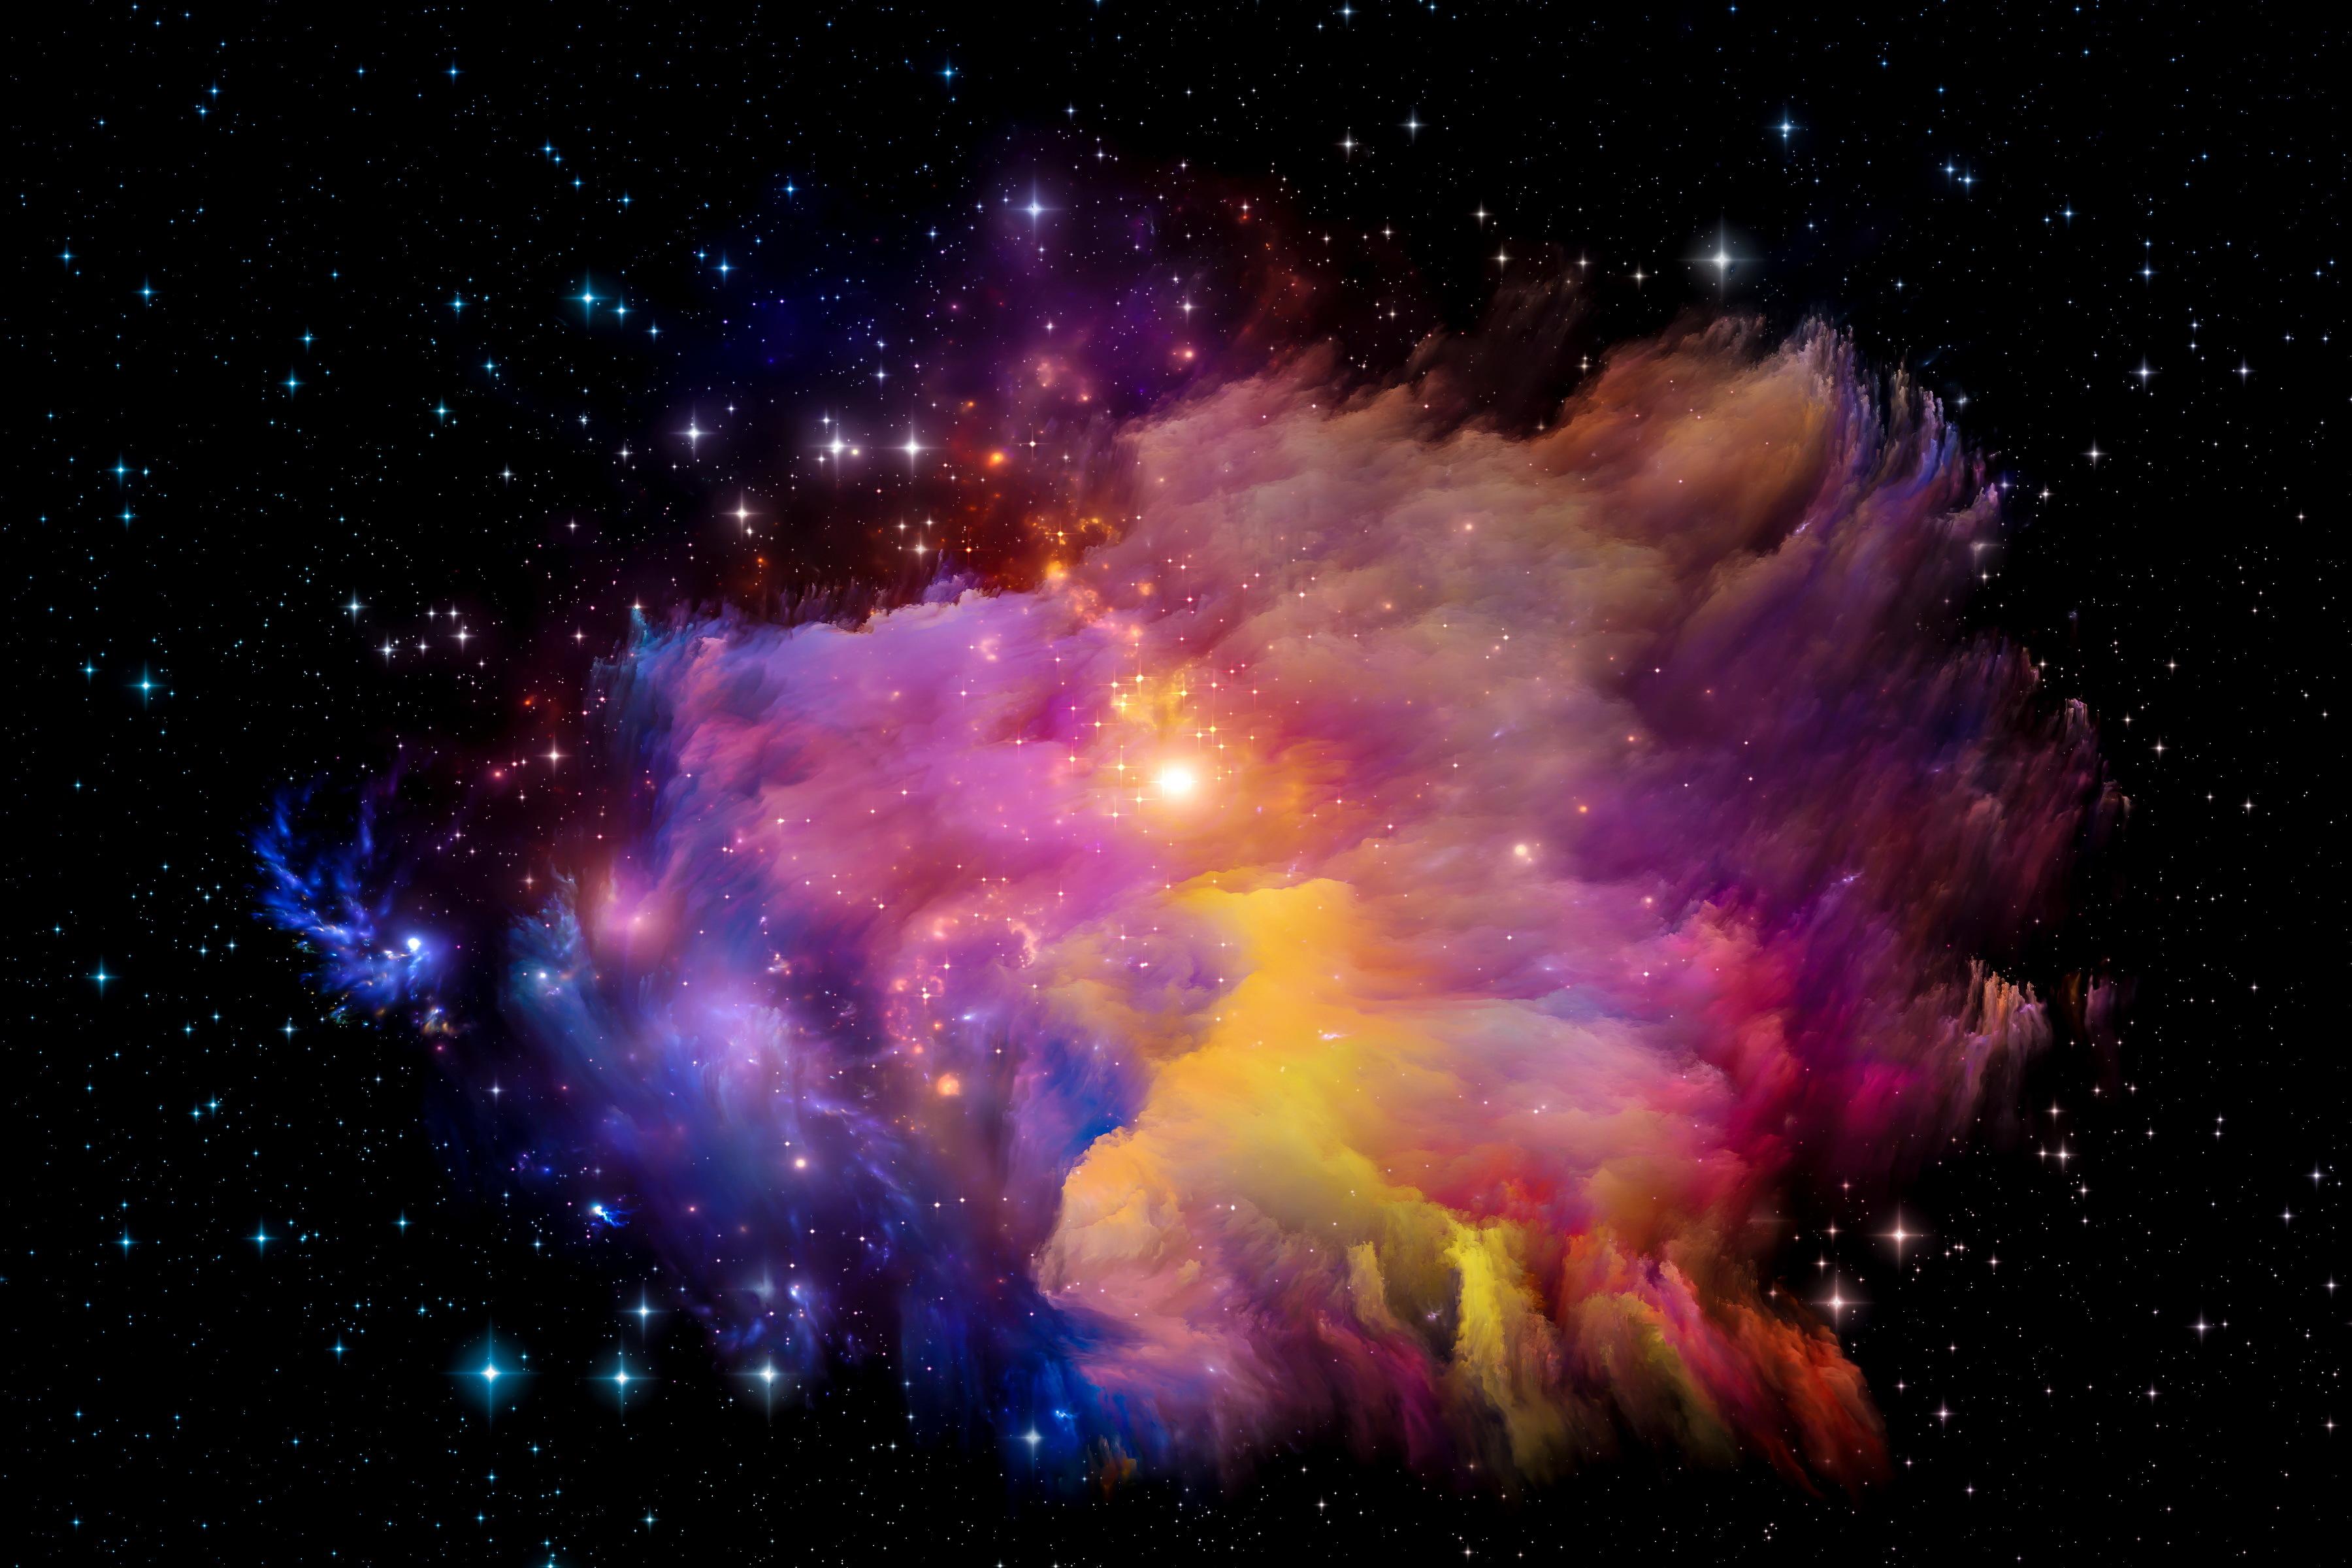 colorful galaxy stars - HD1920×1080